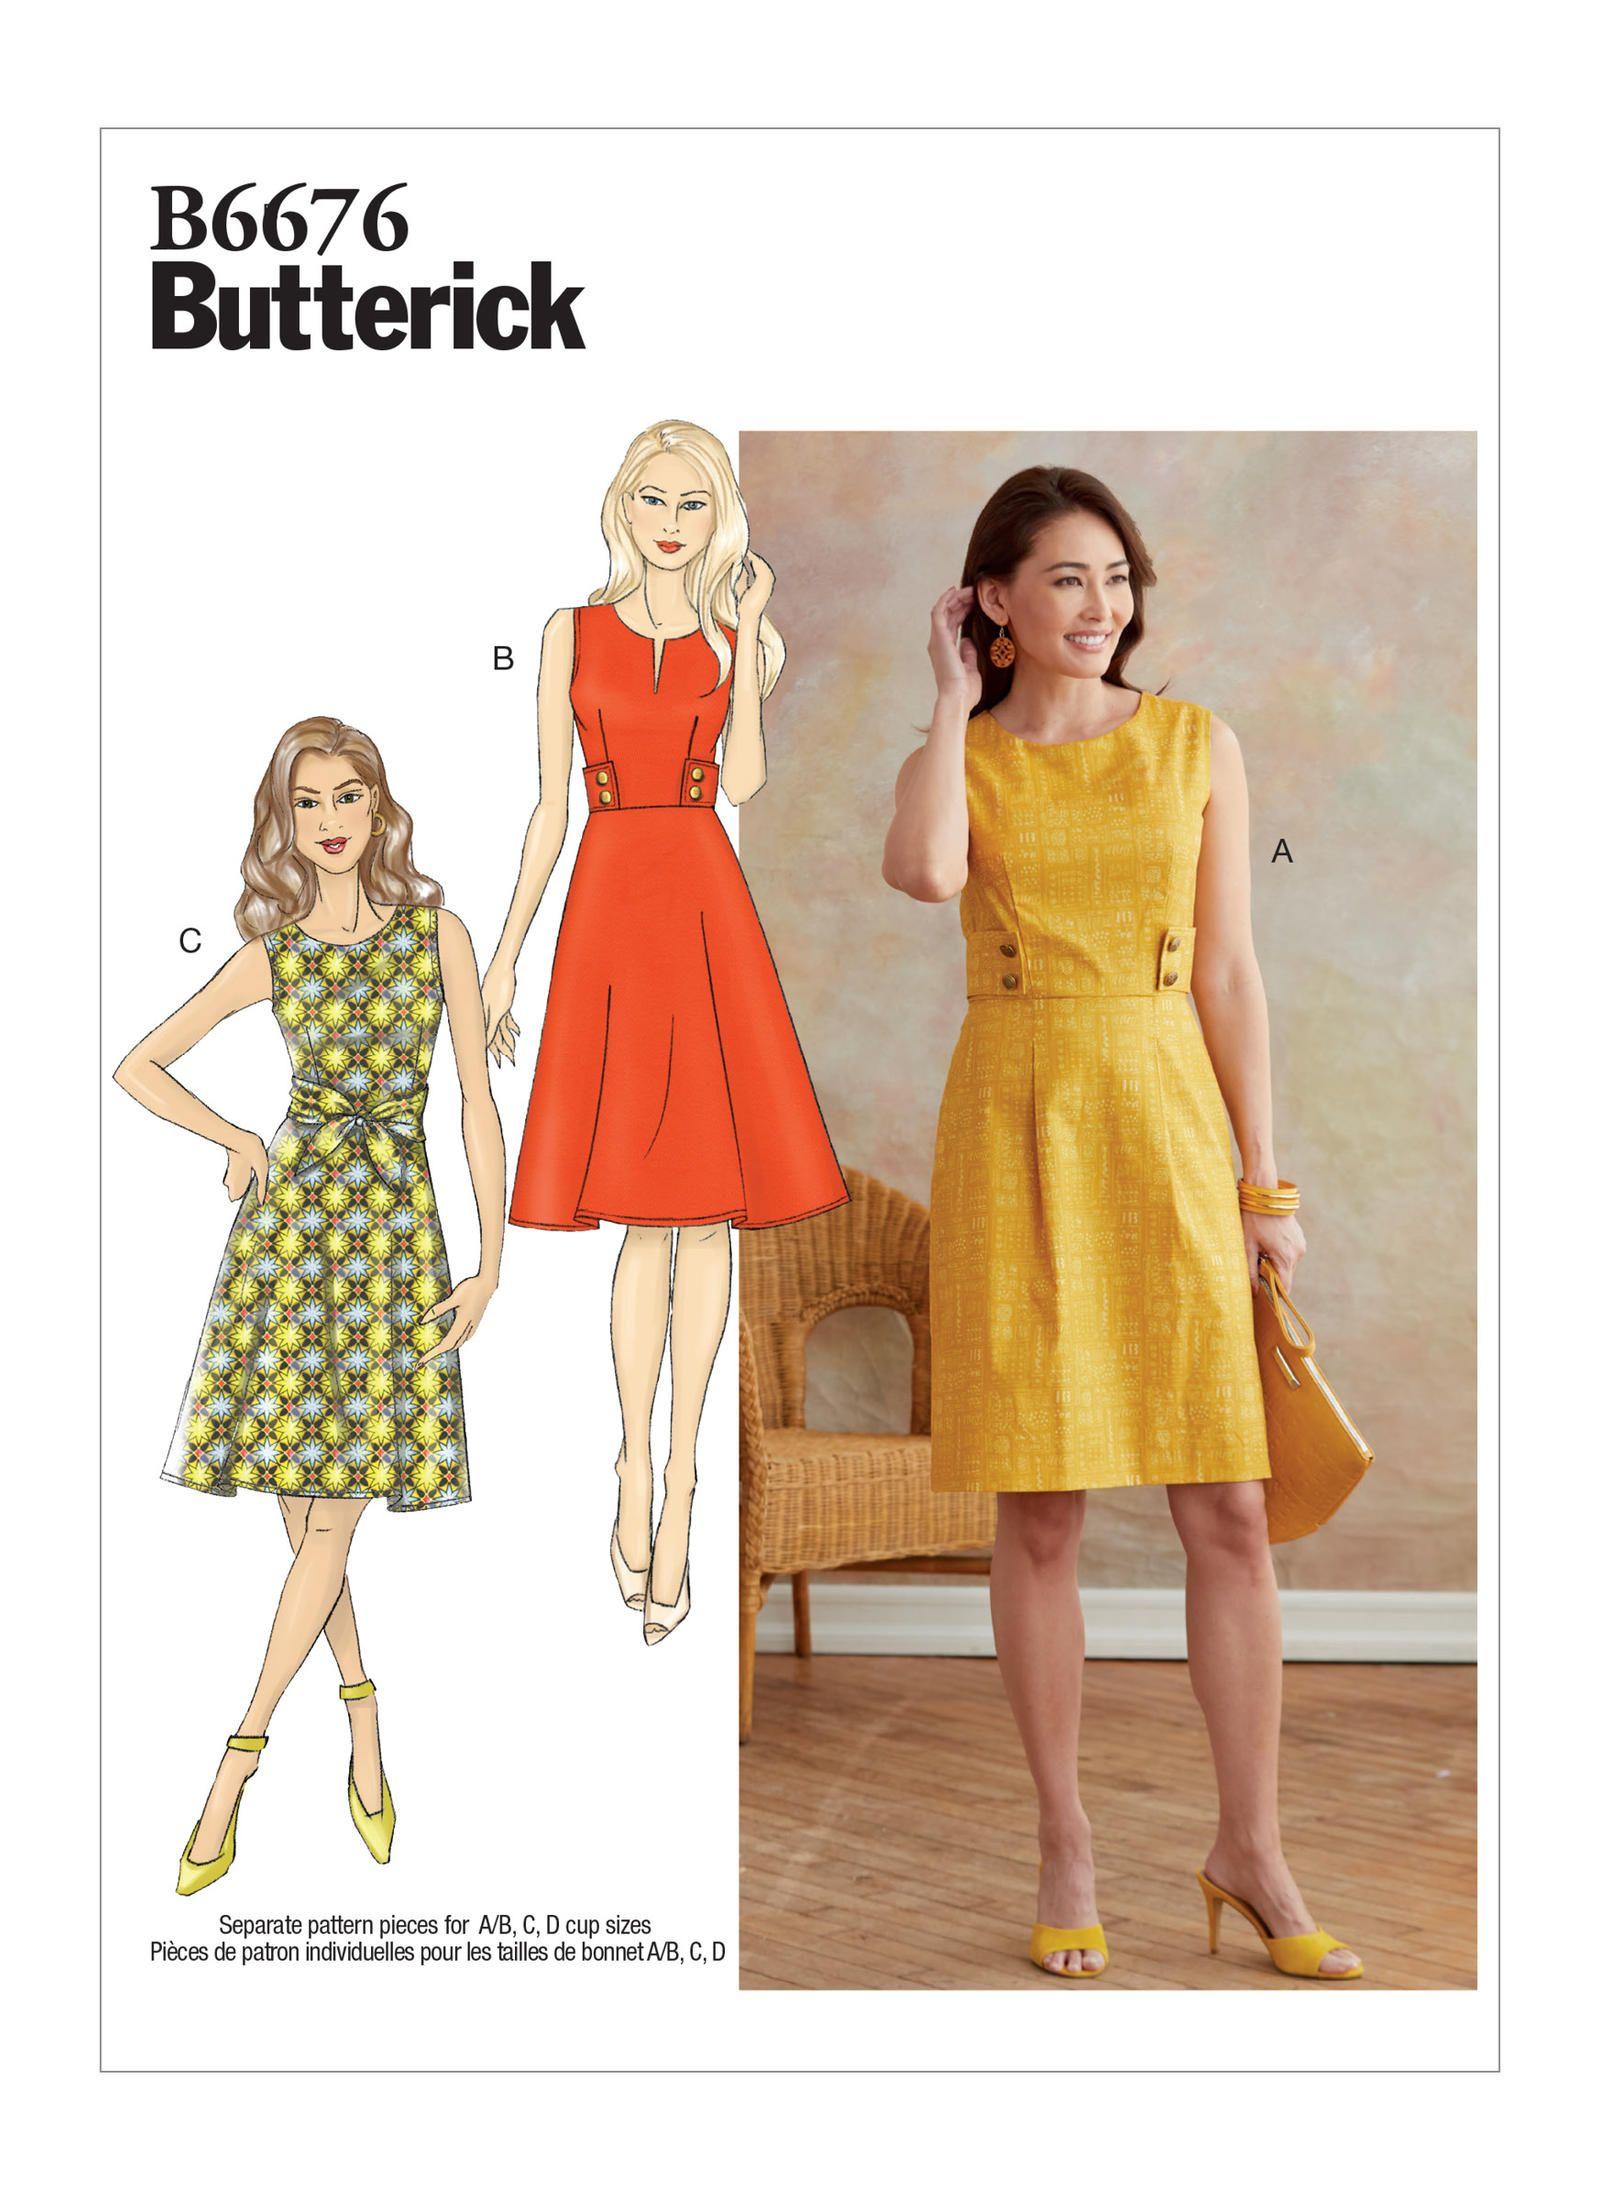 B6676 Misses Dress Sewing Pattern Butterick Patterns Sewing Dresses Miss Dress Butterick Sewing Pattern [ 2200 x 1600 Pixel ]